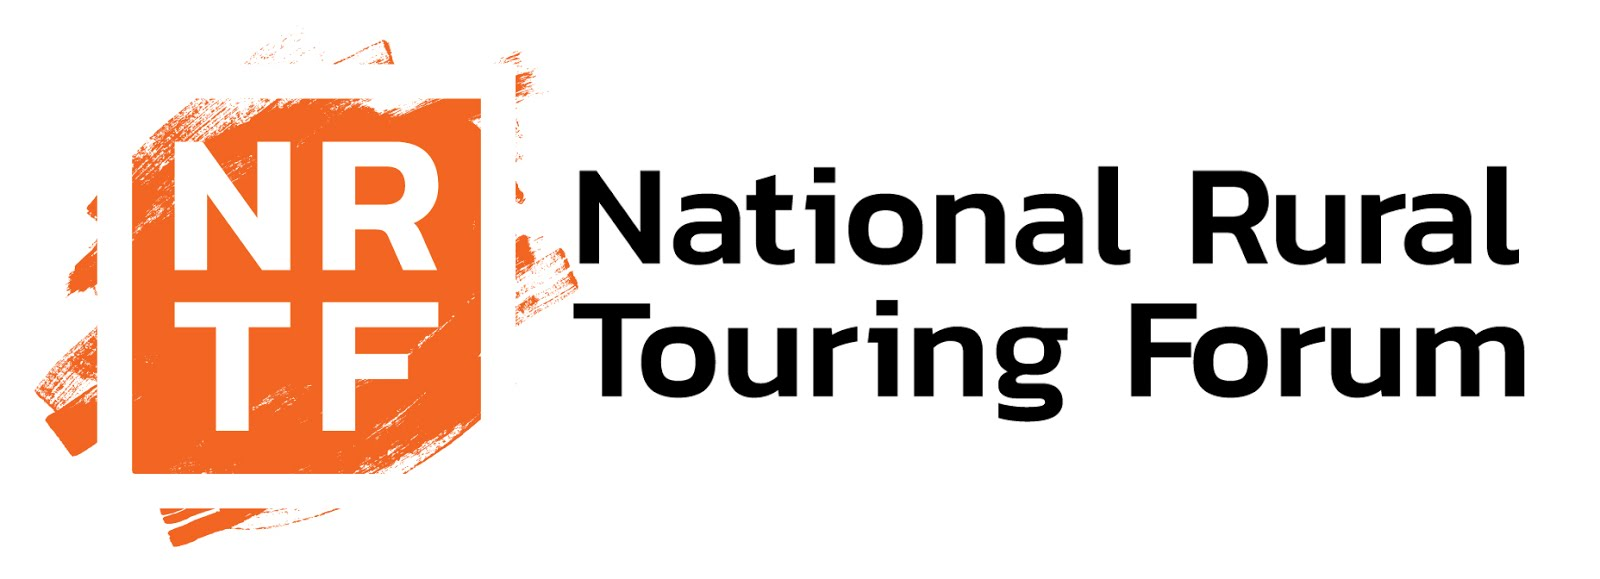 National Rural Touring Forum